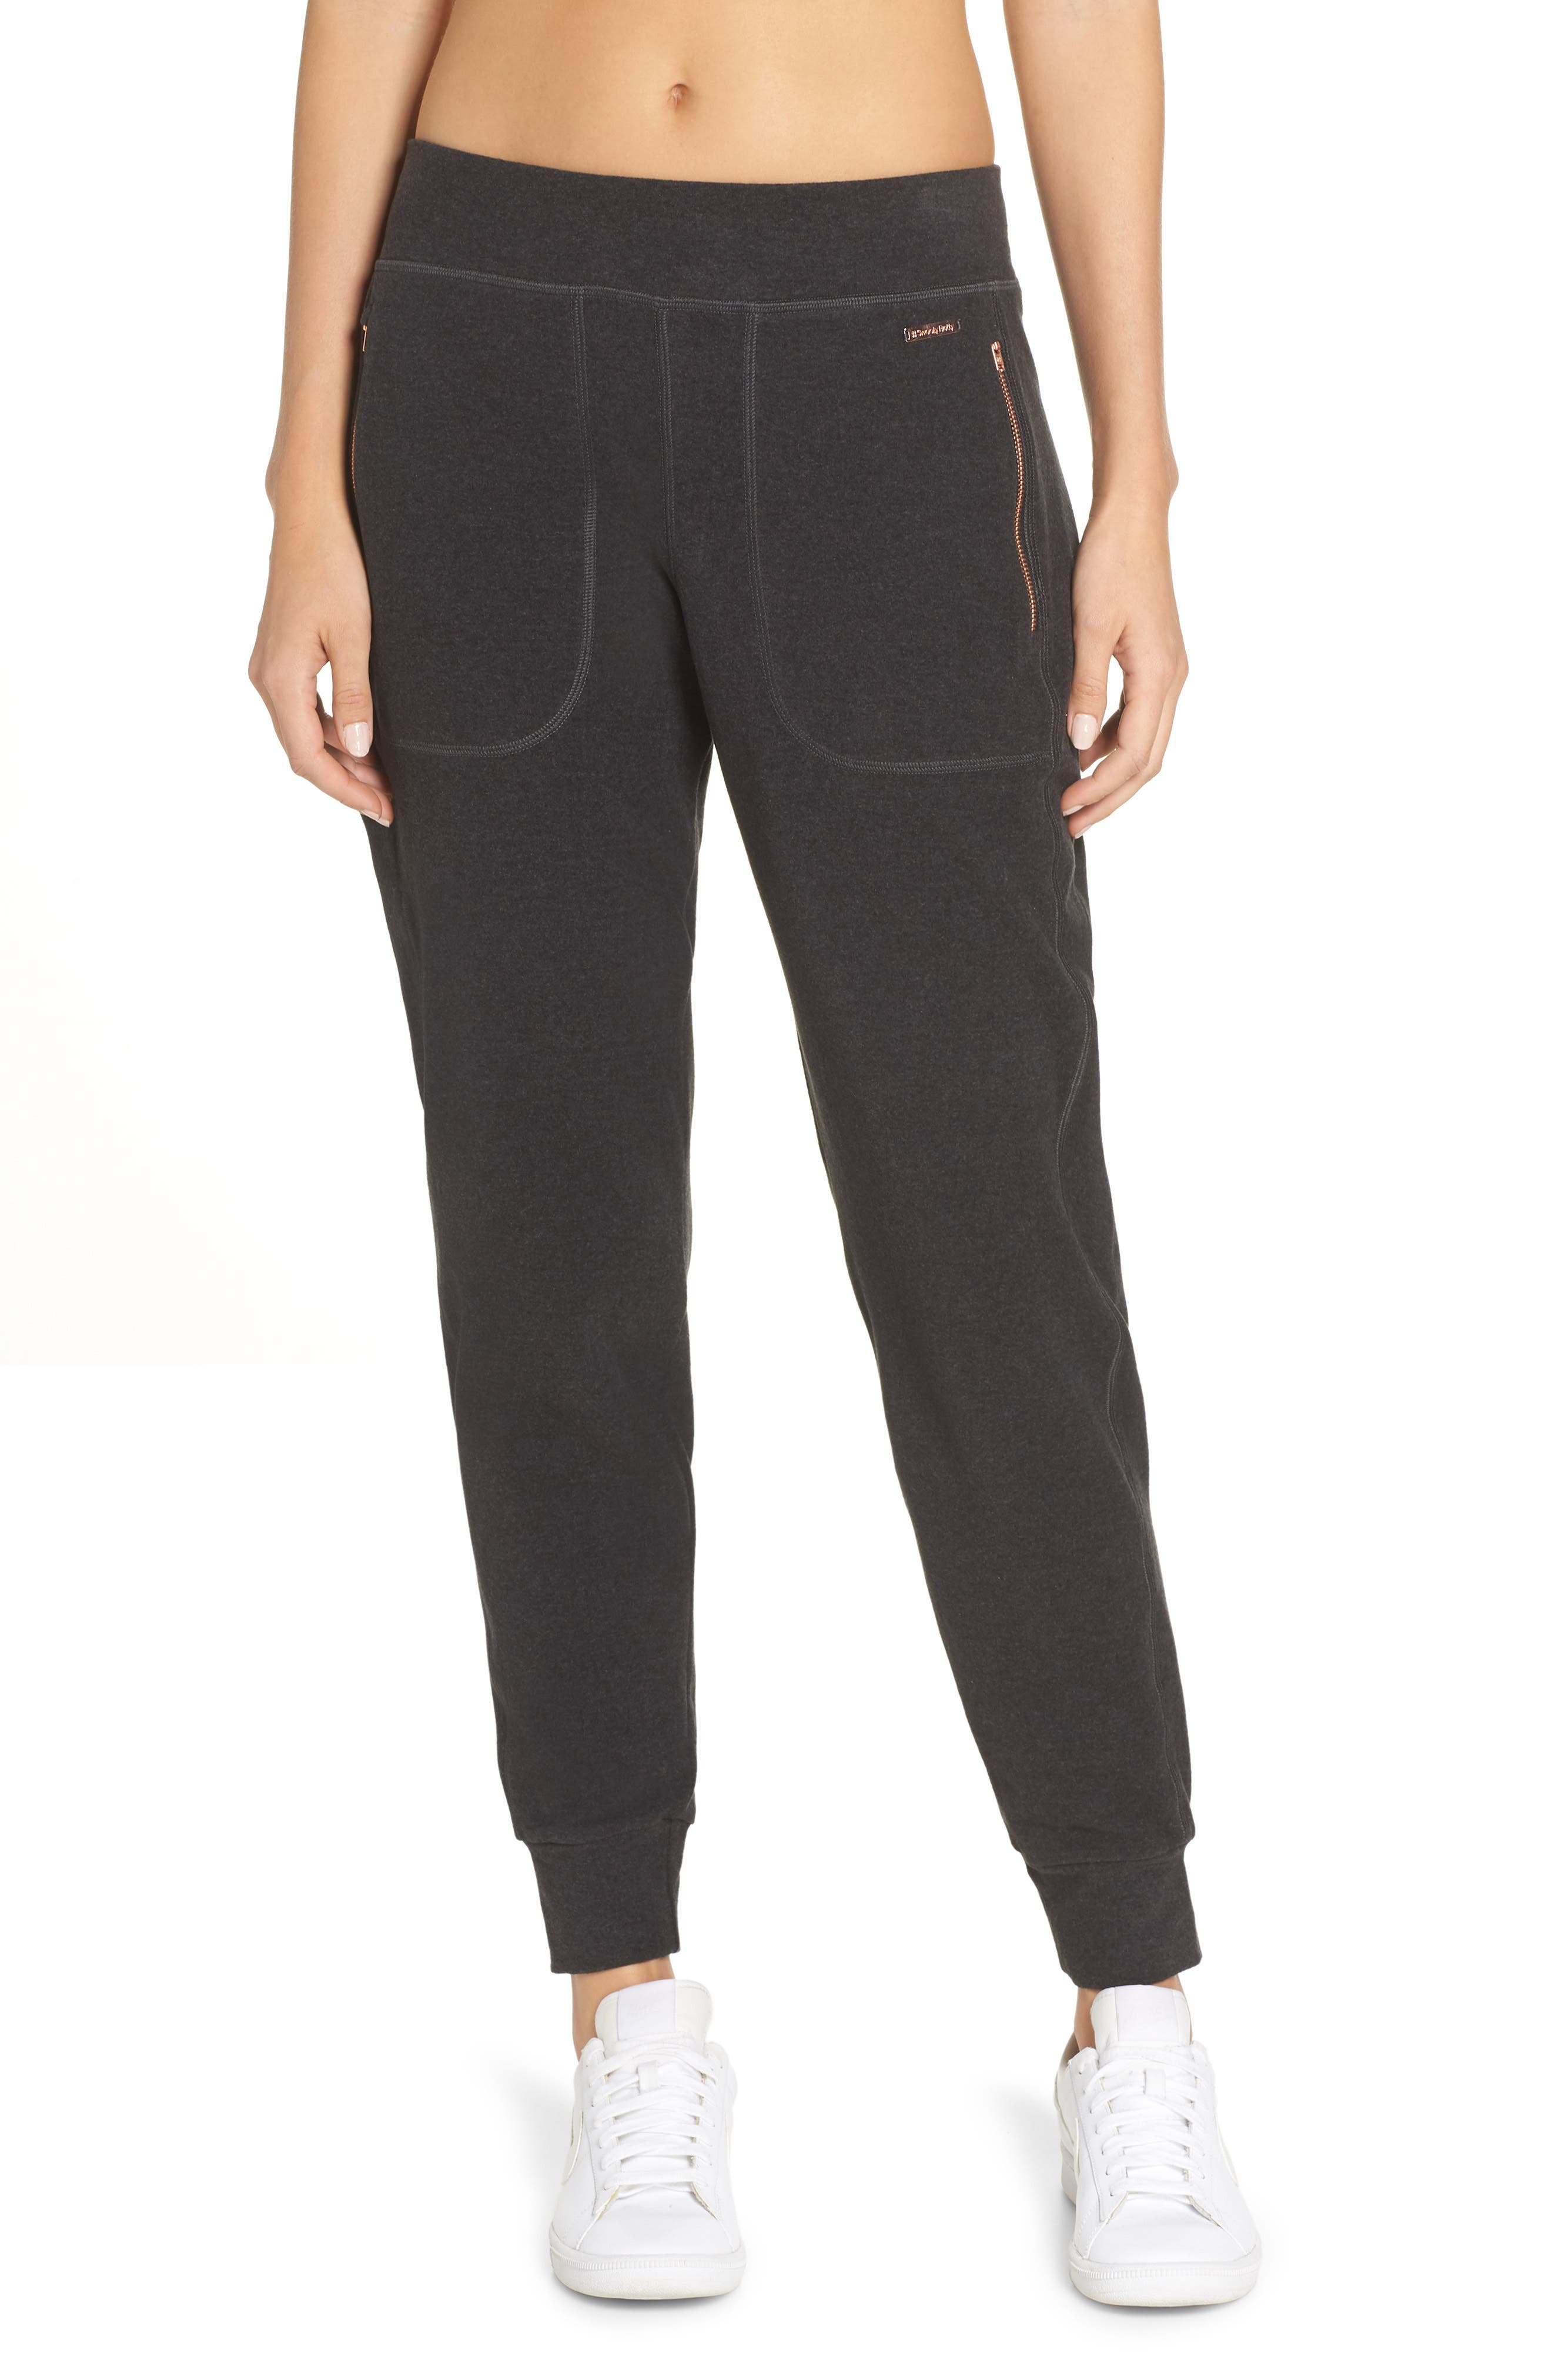 Luxe Liberty Jogger Pants,                         Main,                         color, BLACK MARL